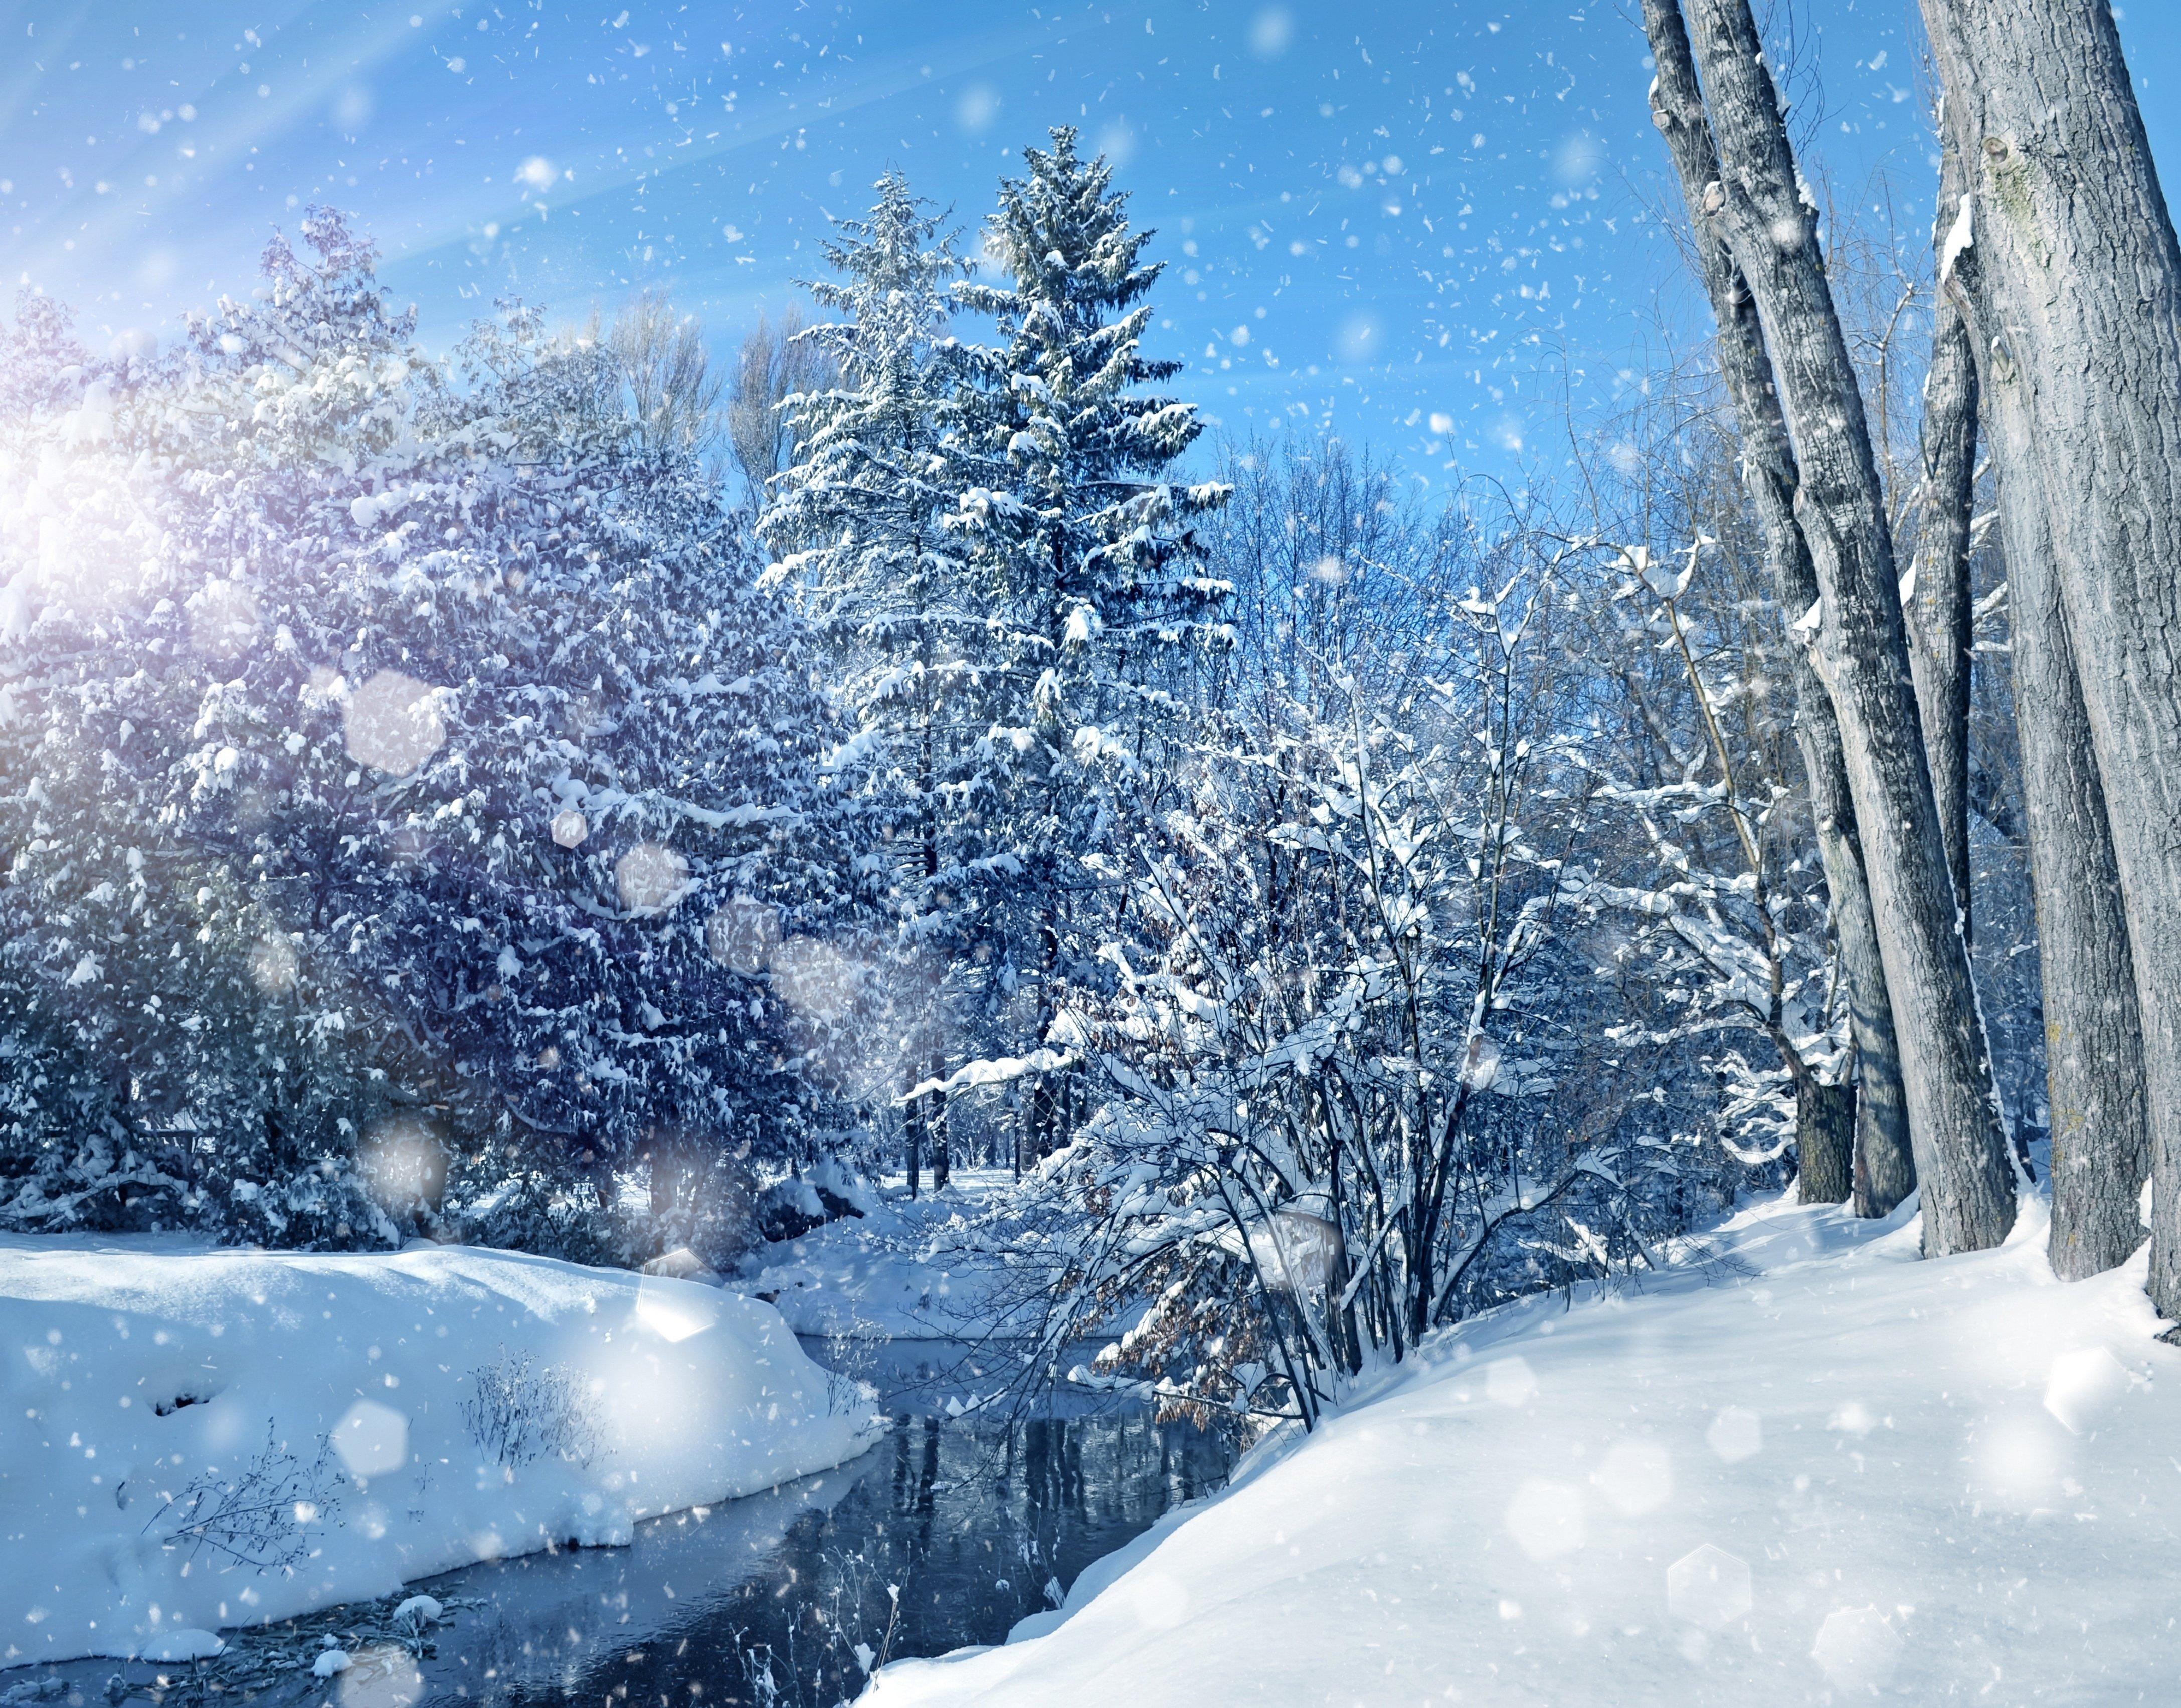 Nature sky trees landscape winter bokeh christmas - Christmas nature wallpaper ...